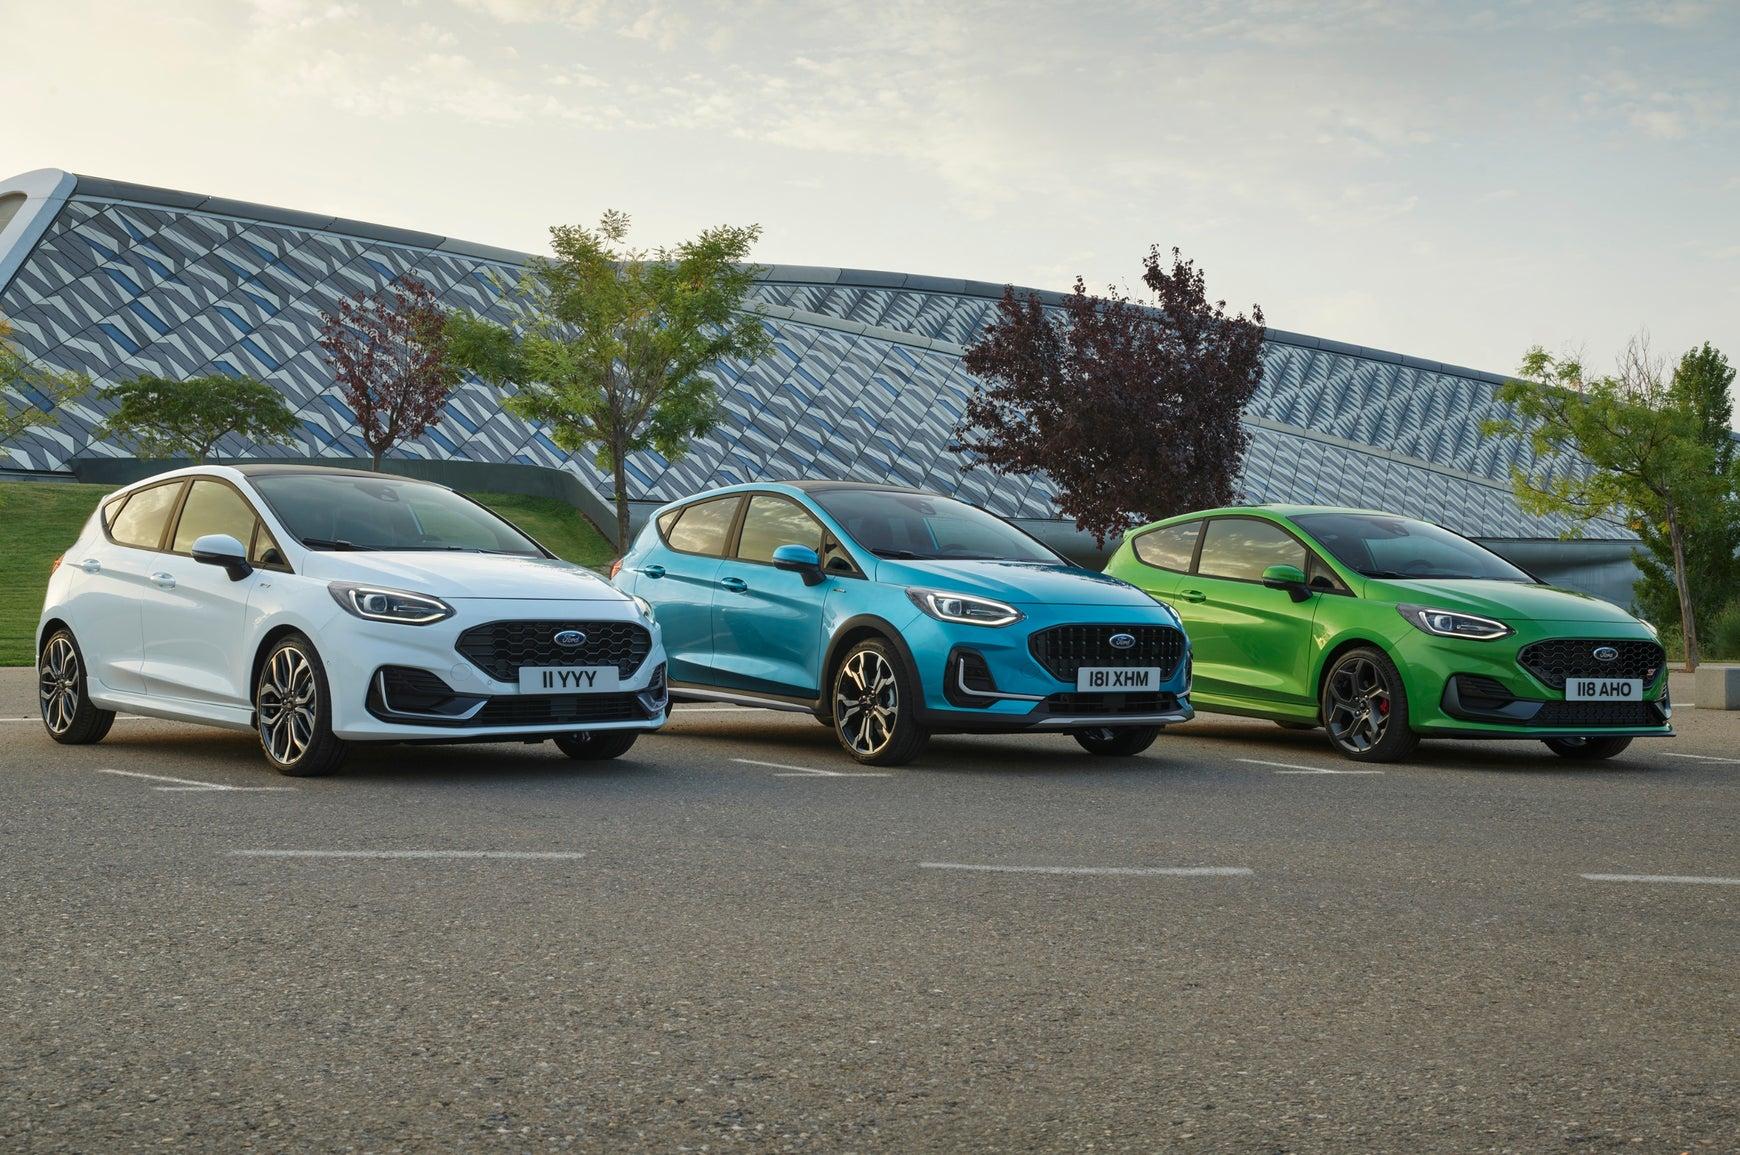 Ford Fiesta 2021 range